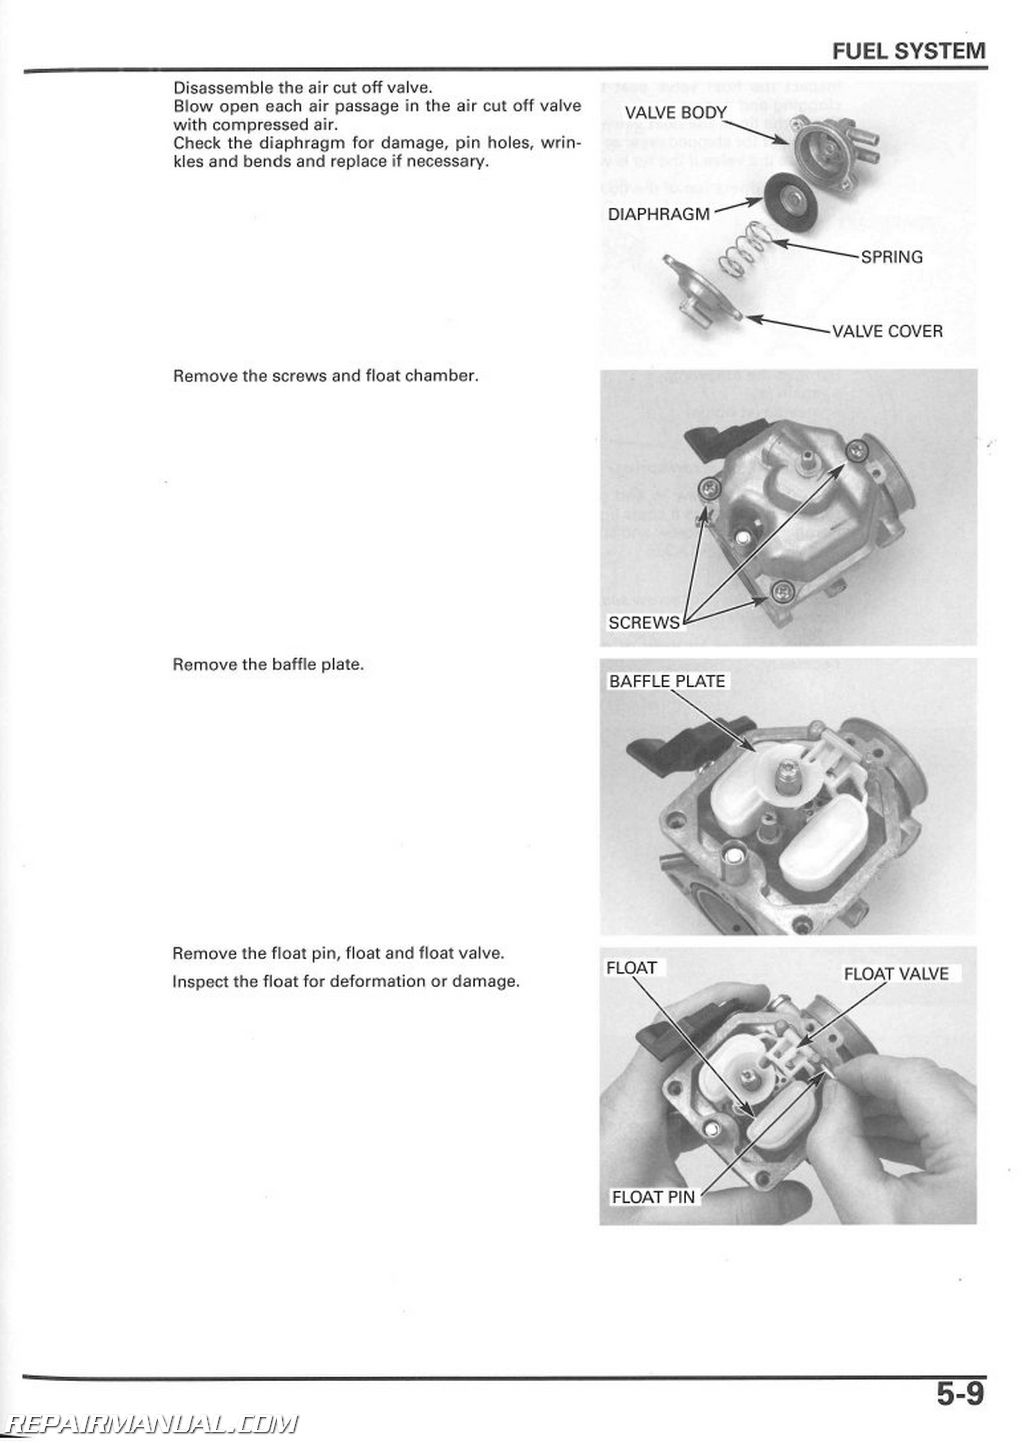 hight resolution of wiring diagram for honda recon atv wiring diagram article reviewwiring diagram for 2005 honda recon